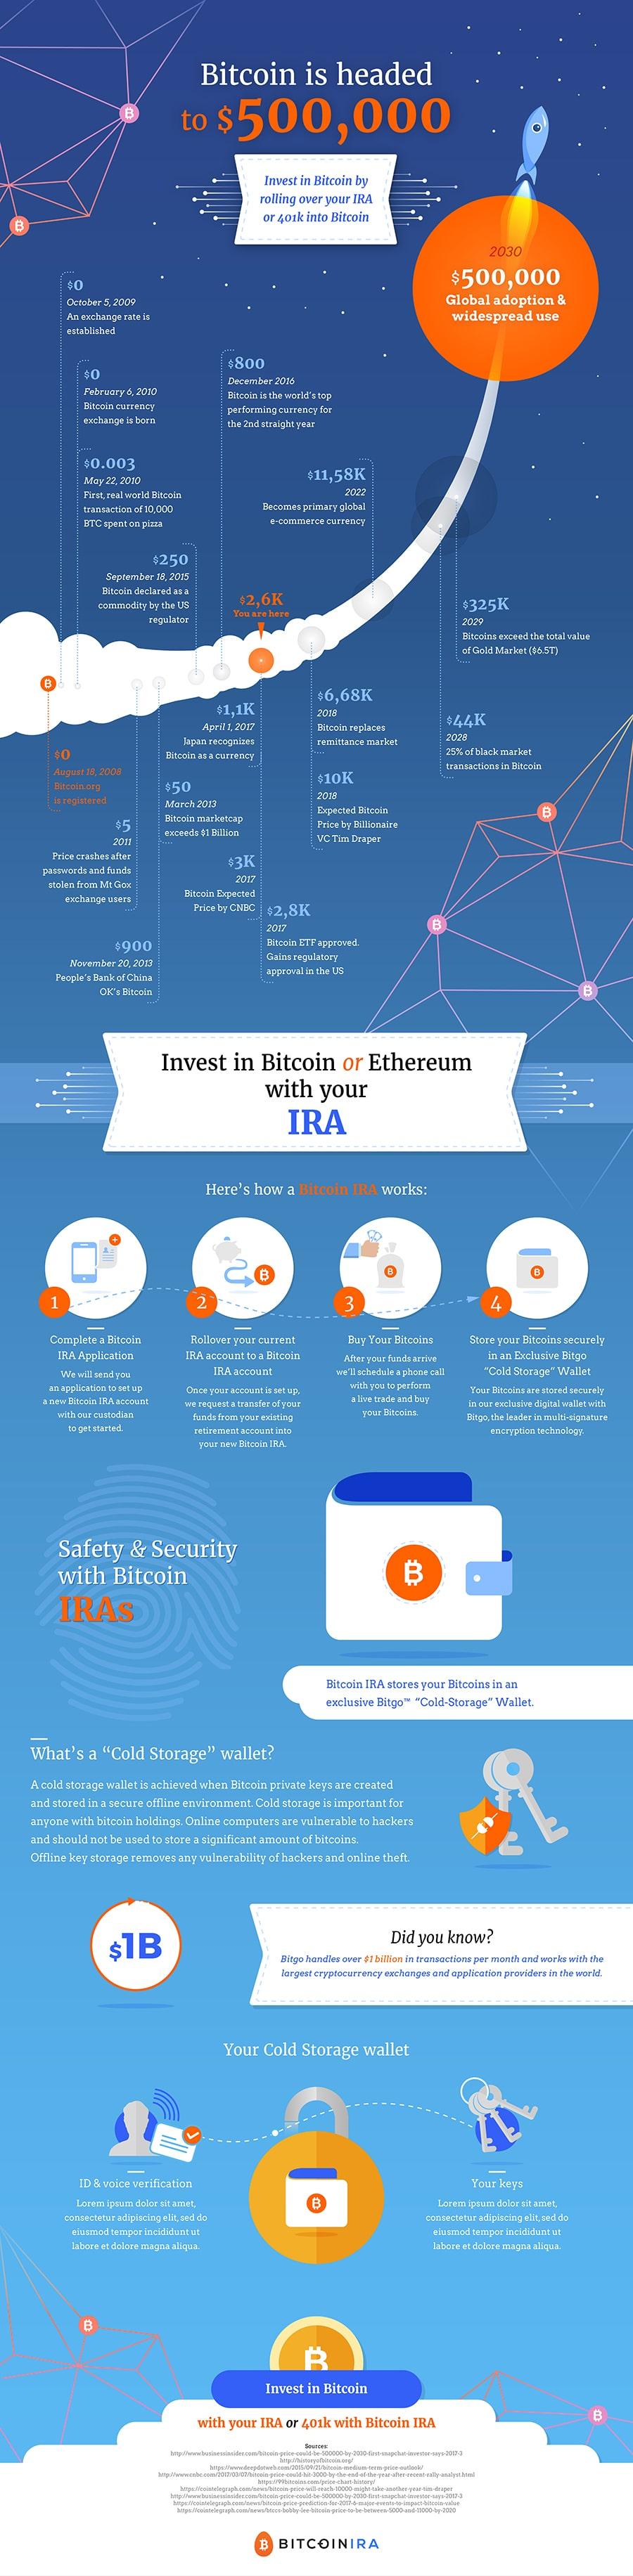 velvetmade bitcoin IRA infographic design